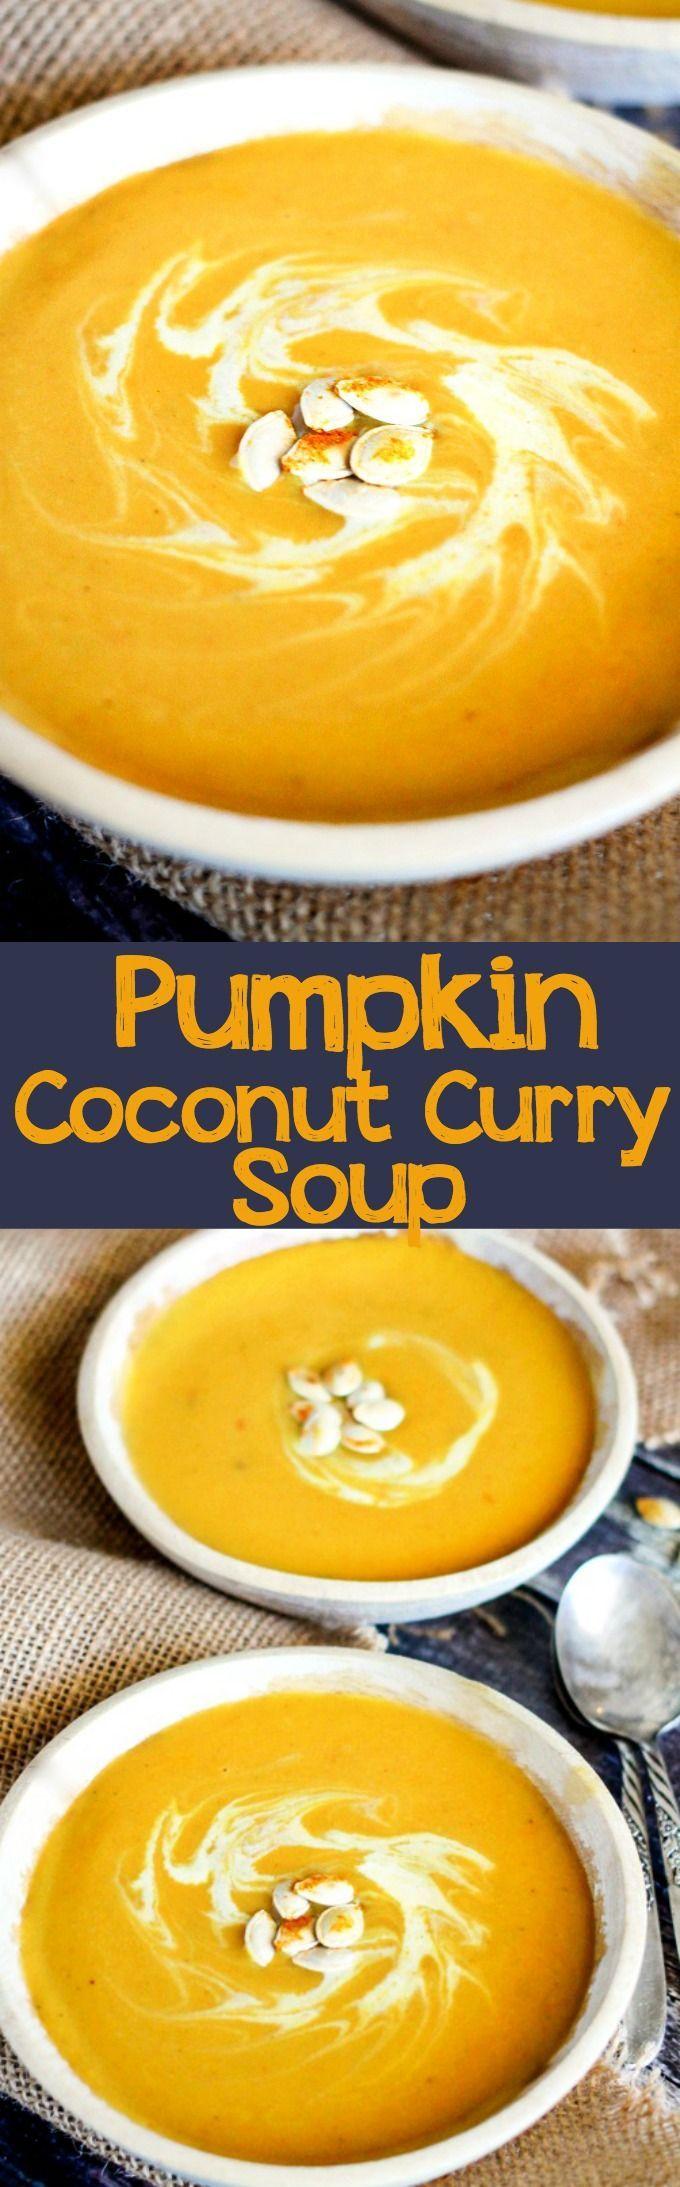 Pumpkin Coconut Curry Soup - Domestic Superhero